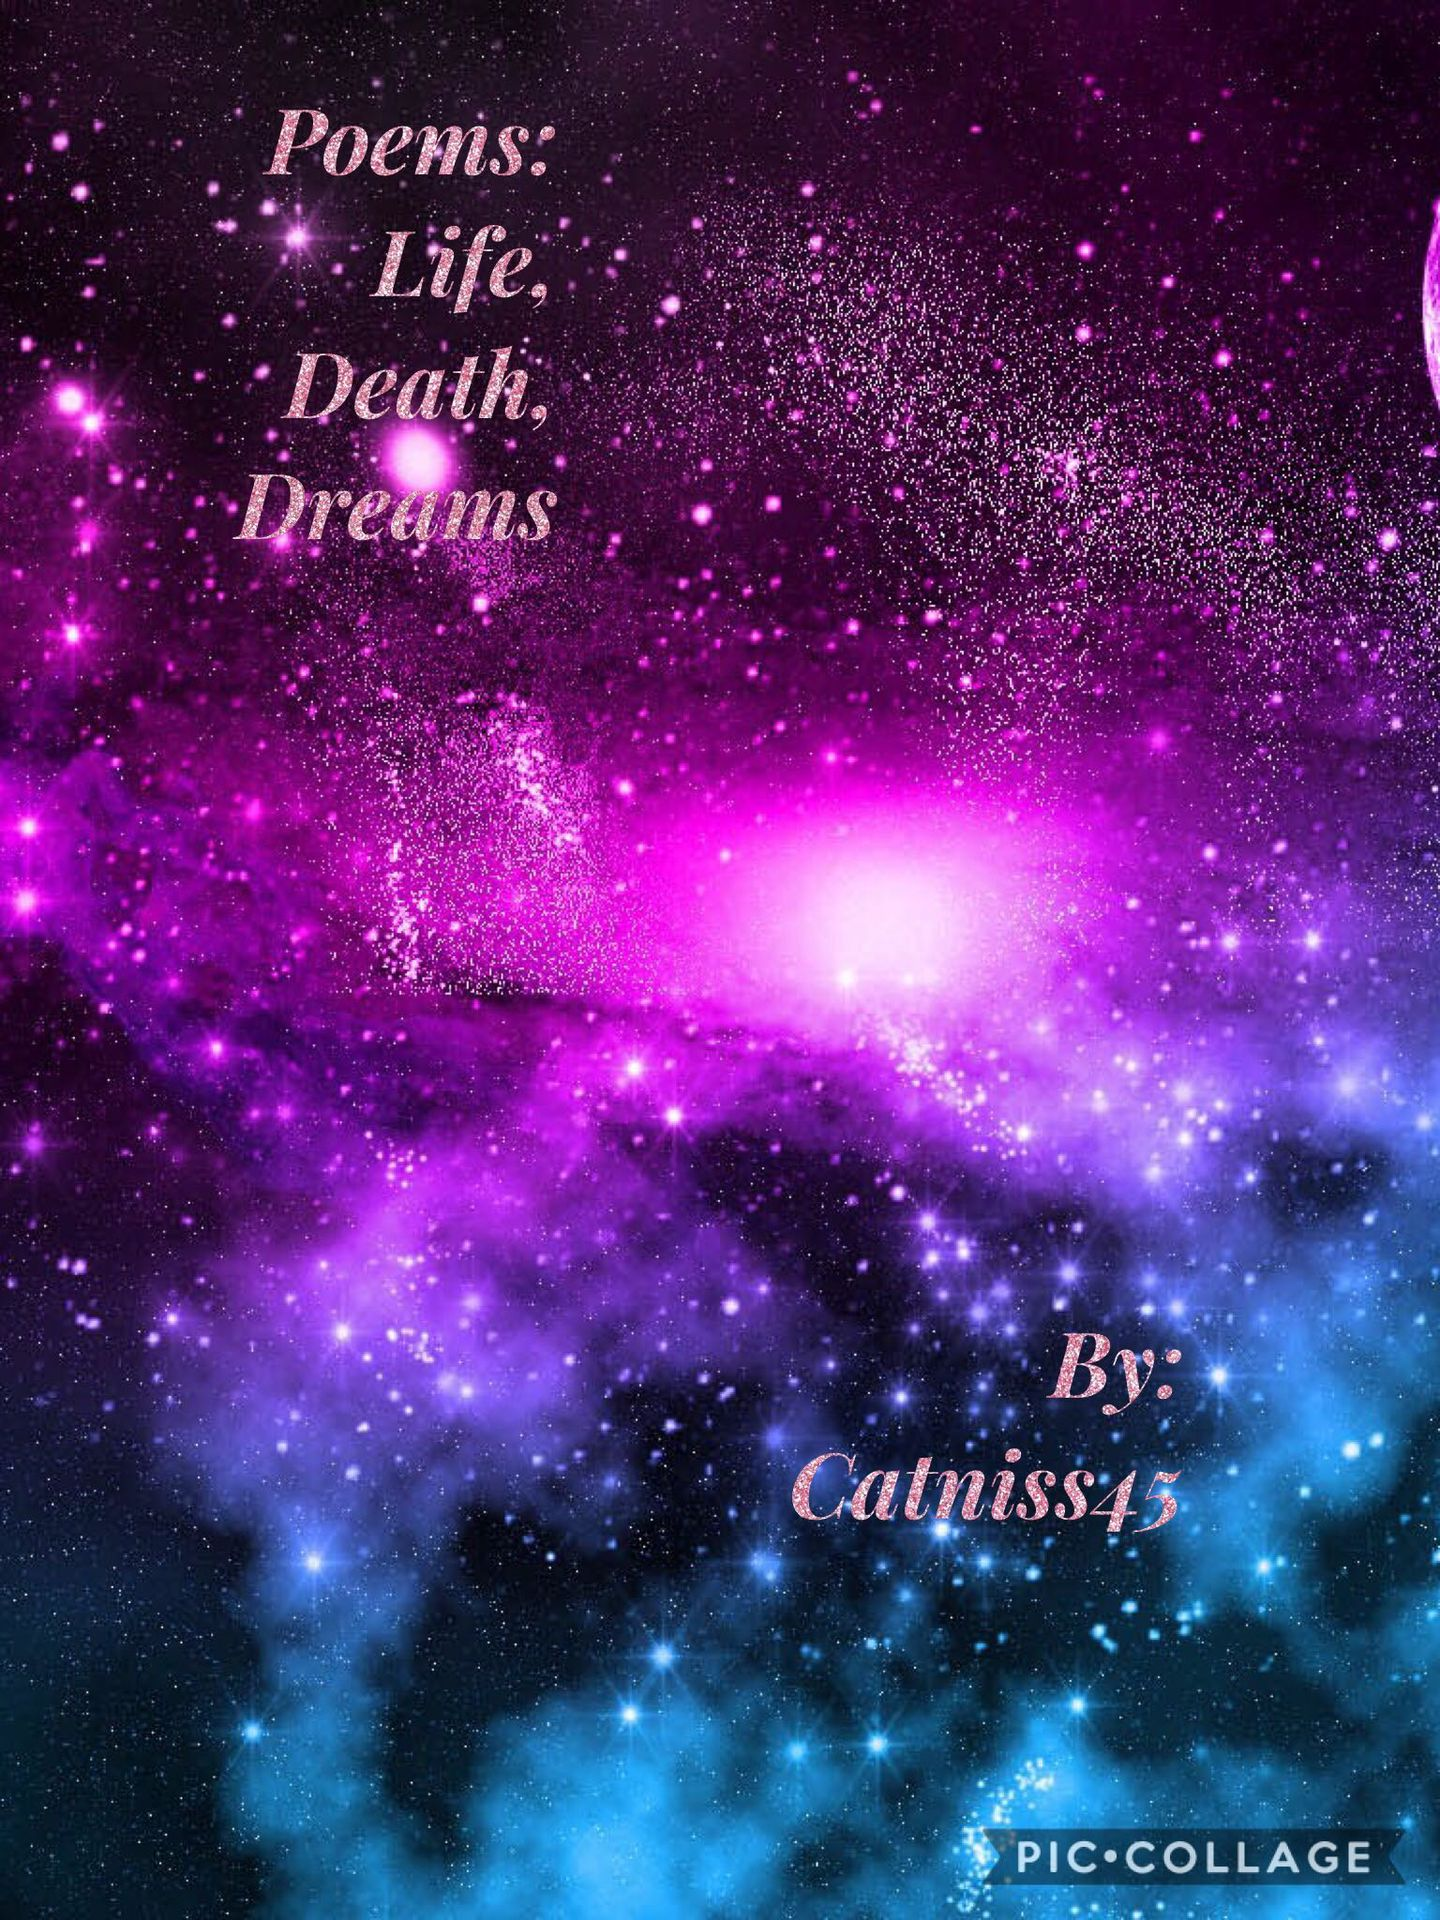 Poems - Poems: Life, Death, Dreams - Wattpad